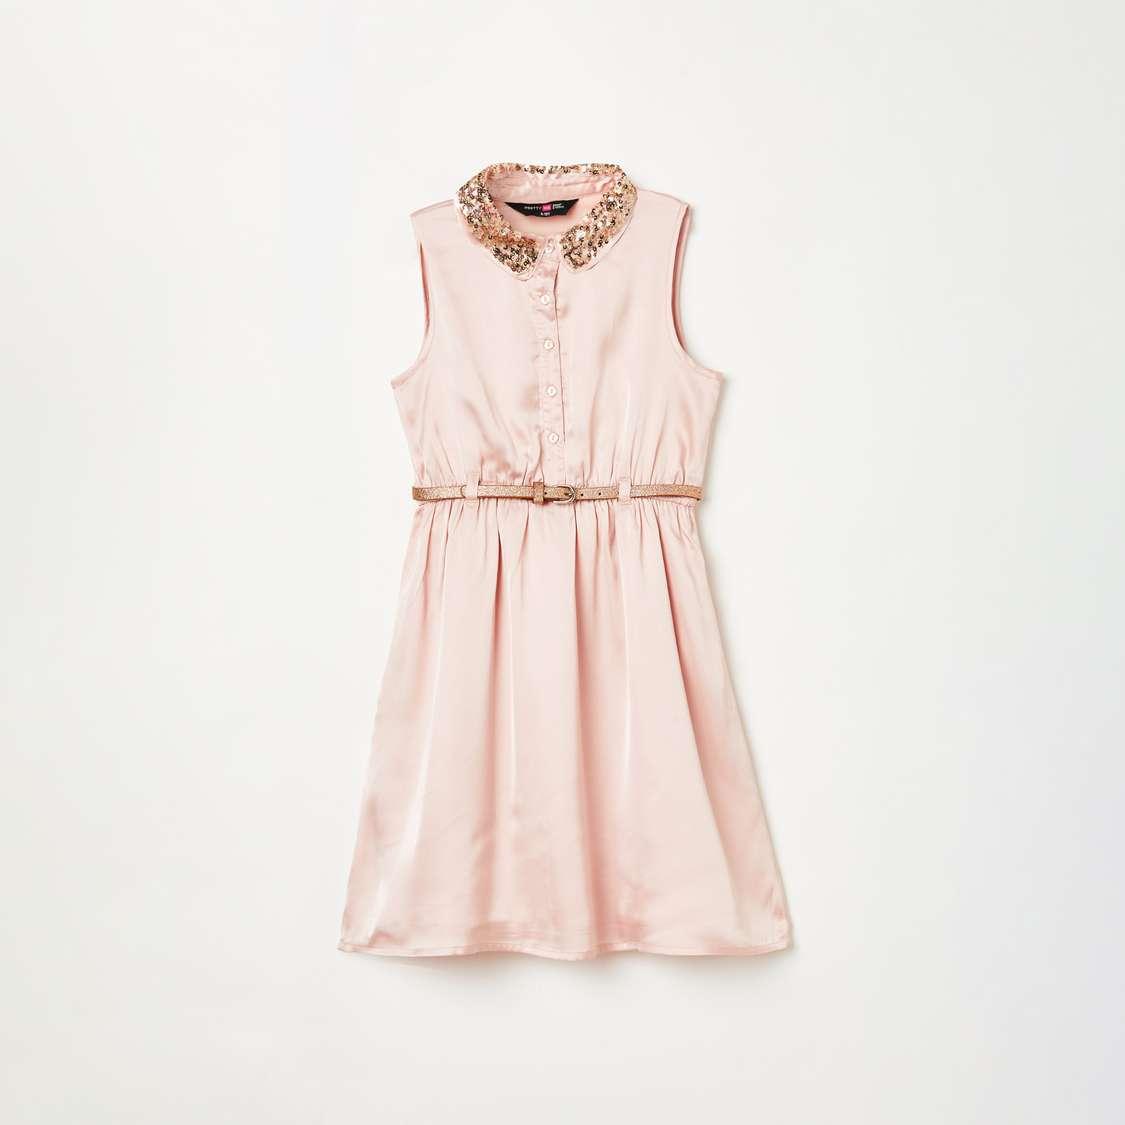 2.PRETTY ME Girls Sequin Embellished A-line Dress